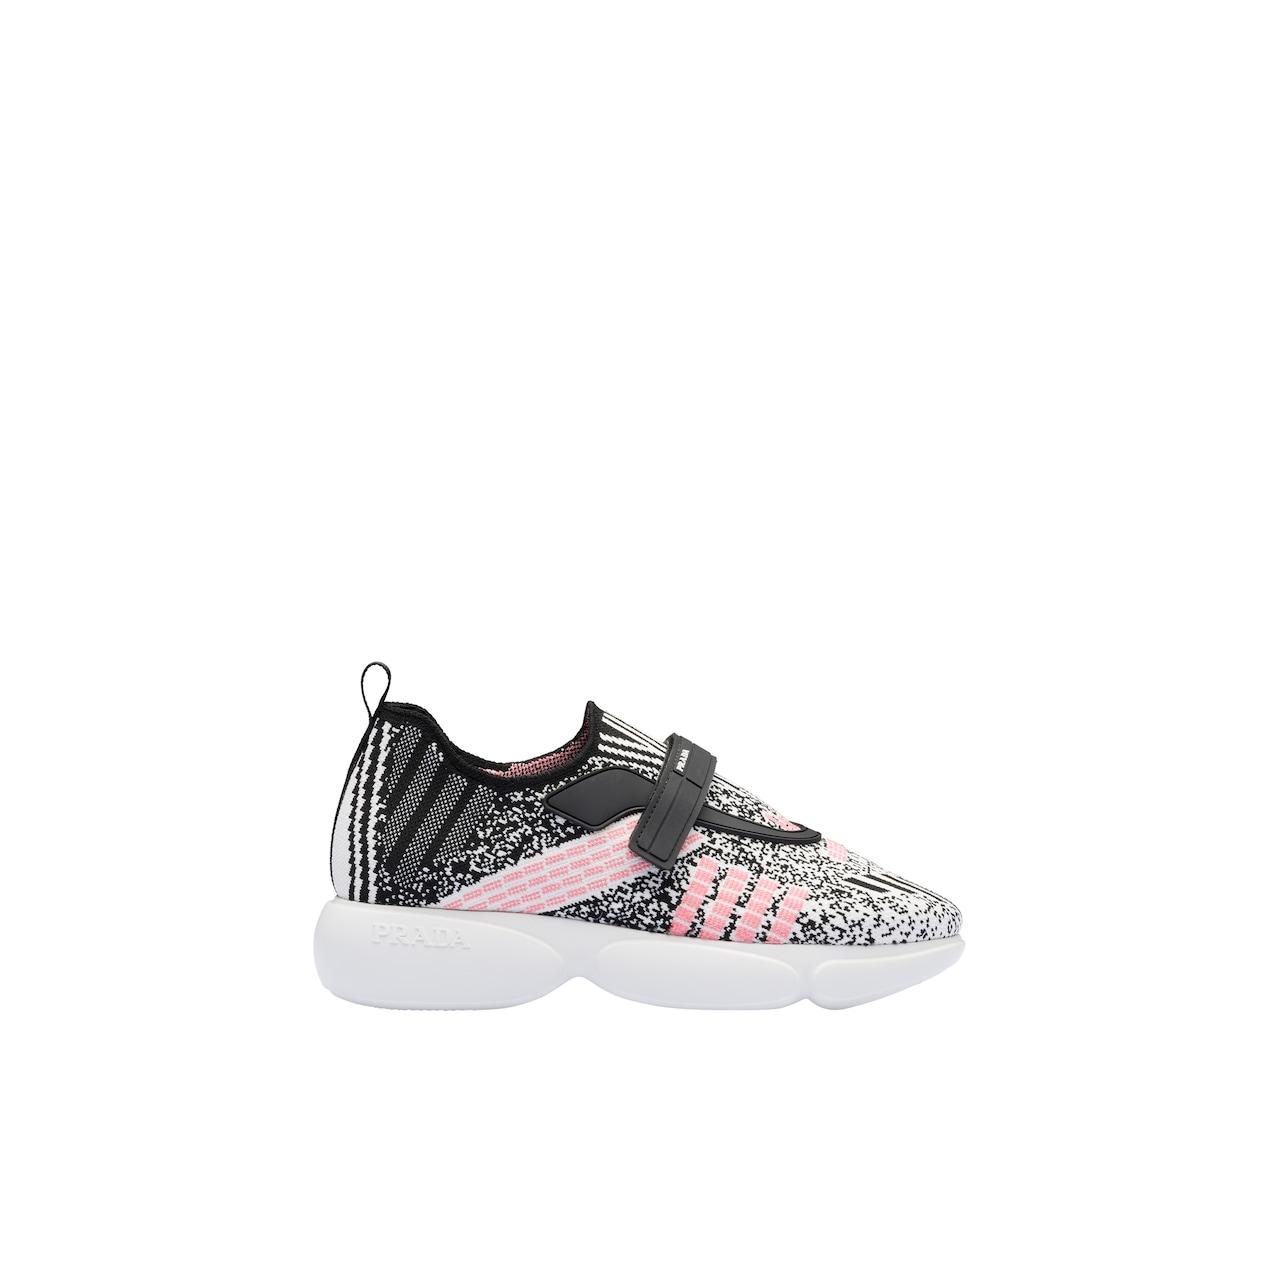 Metallic knit fabric Cloudbust sneakers